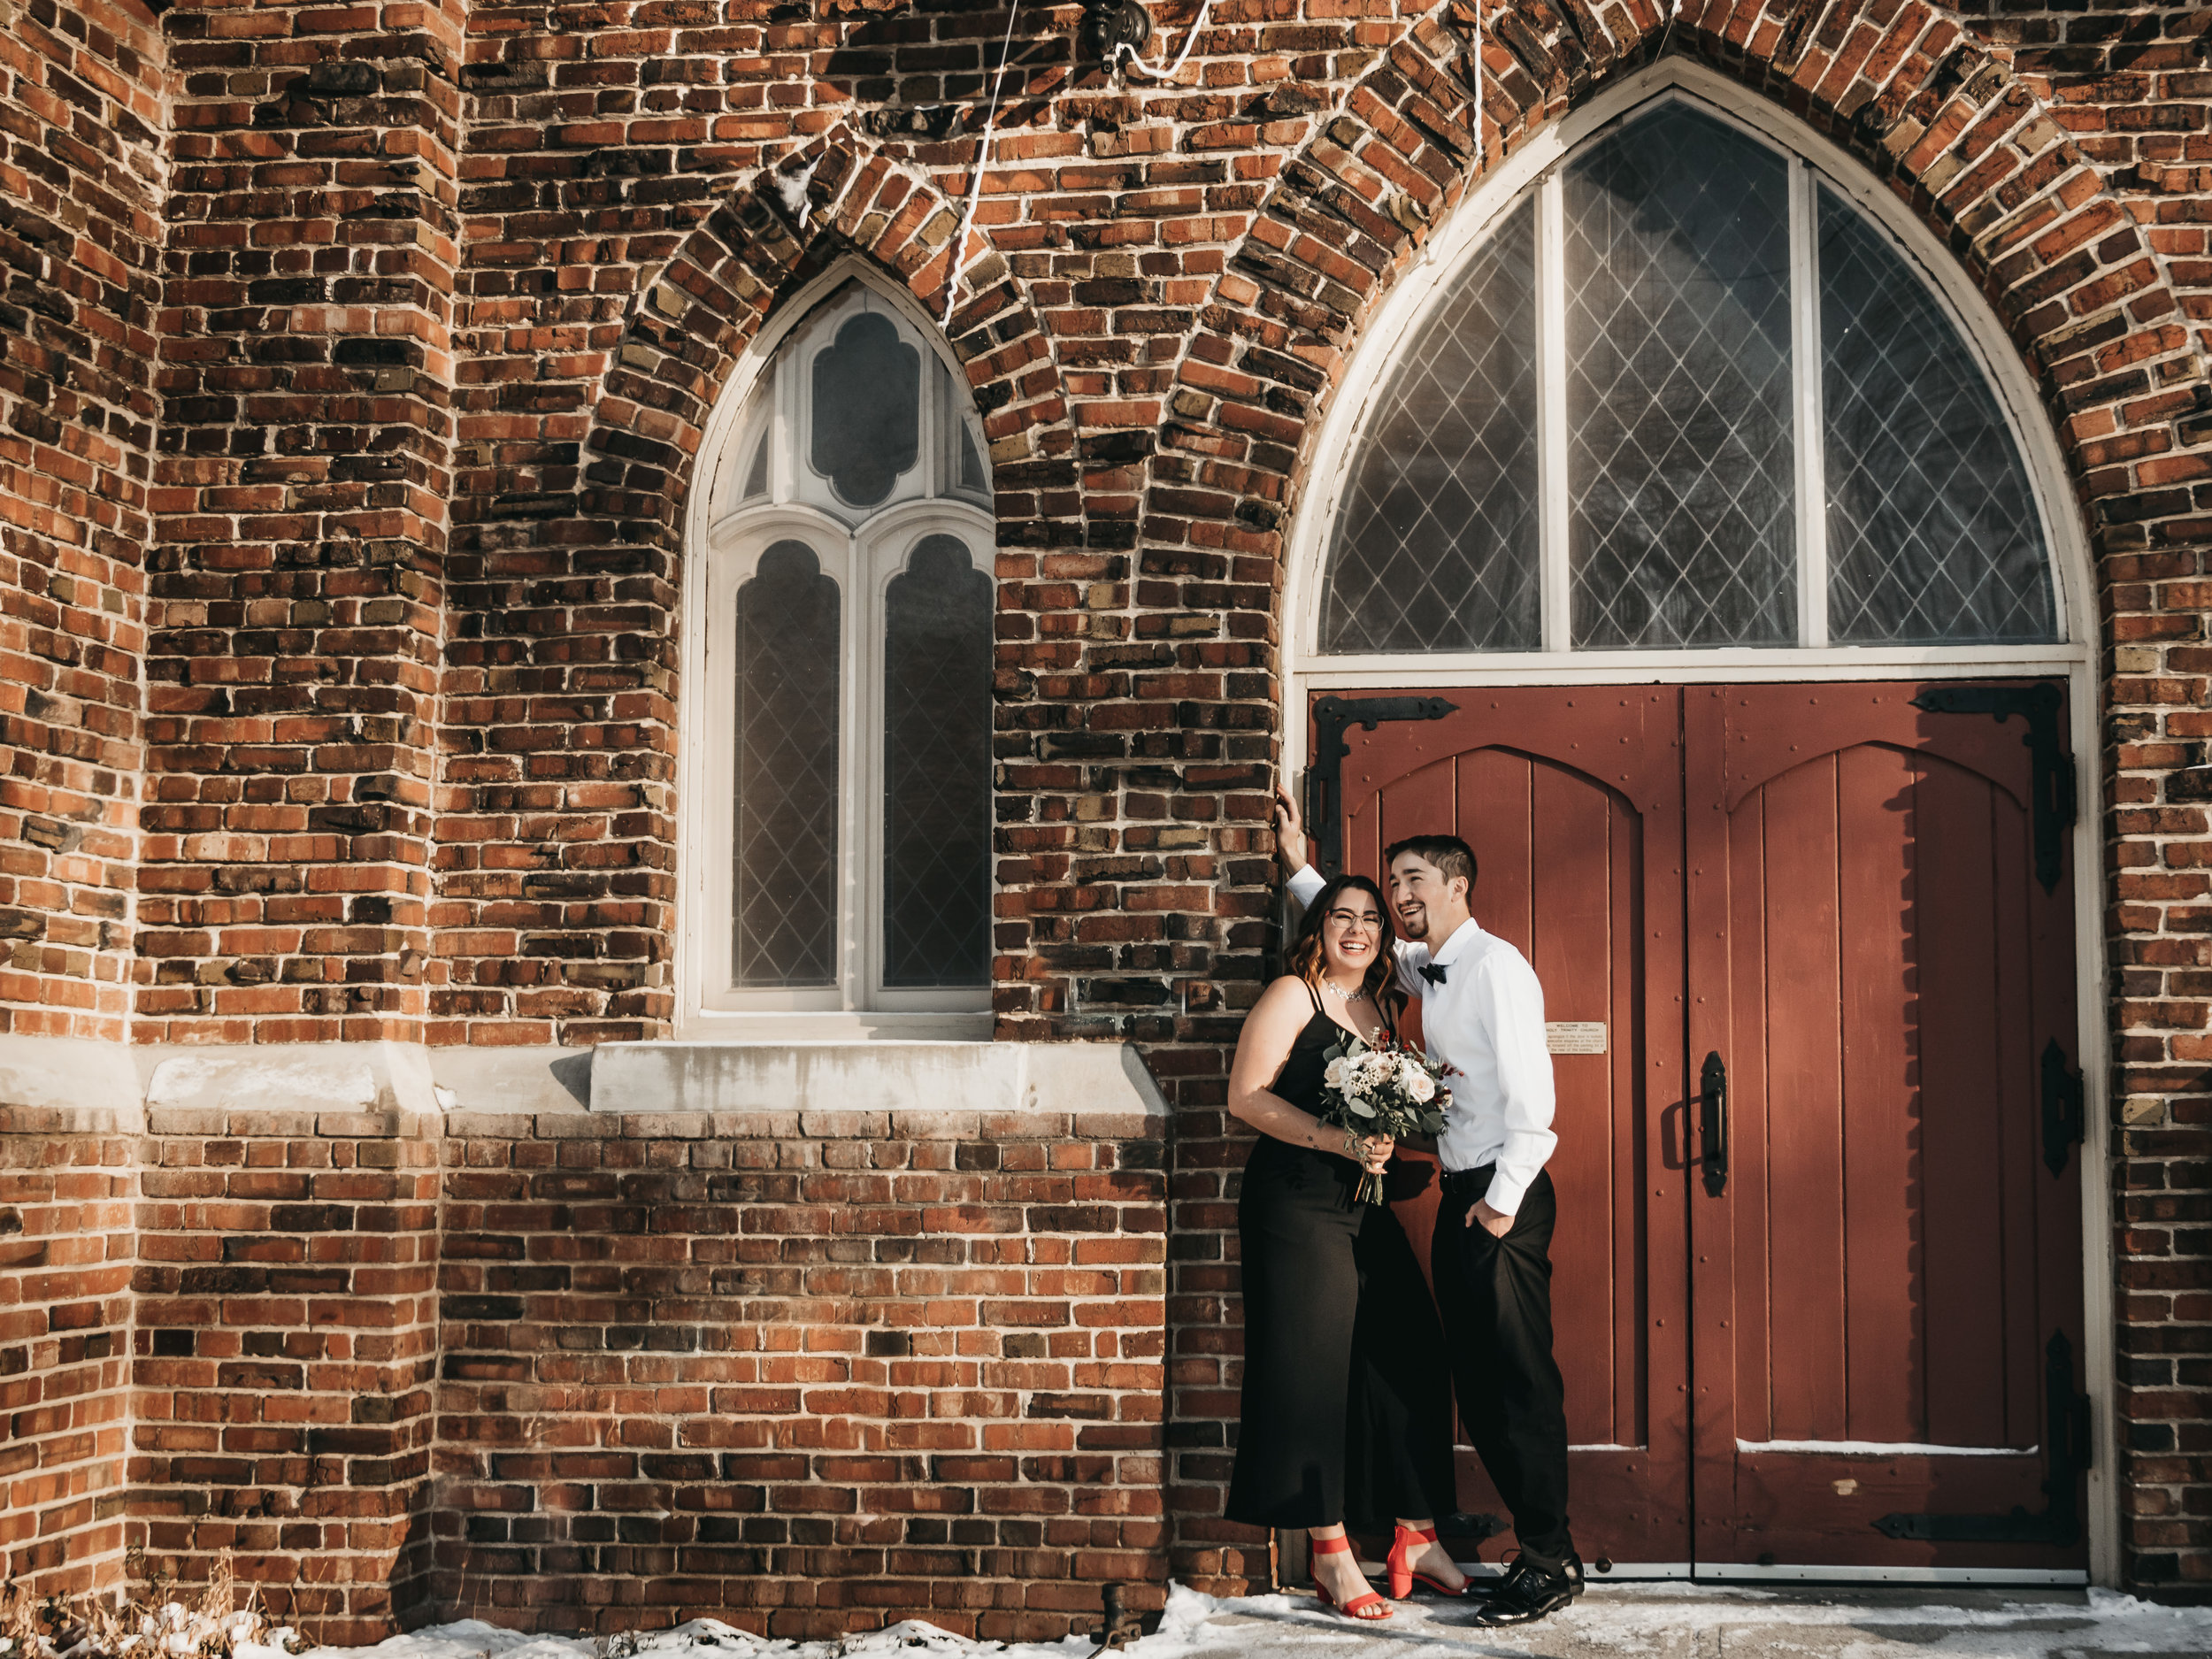 Emma&Chris-EdmontonElopement-4 copy.jpg